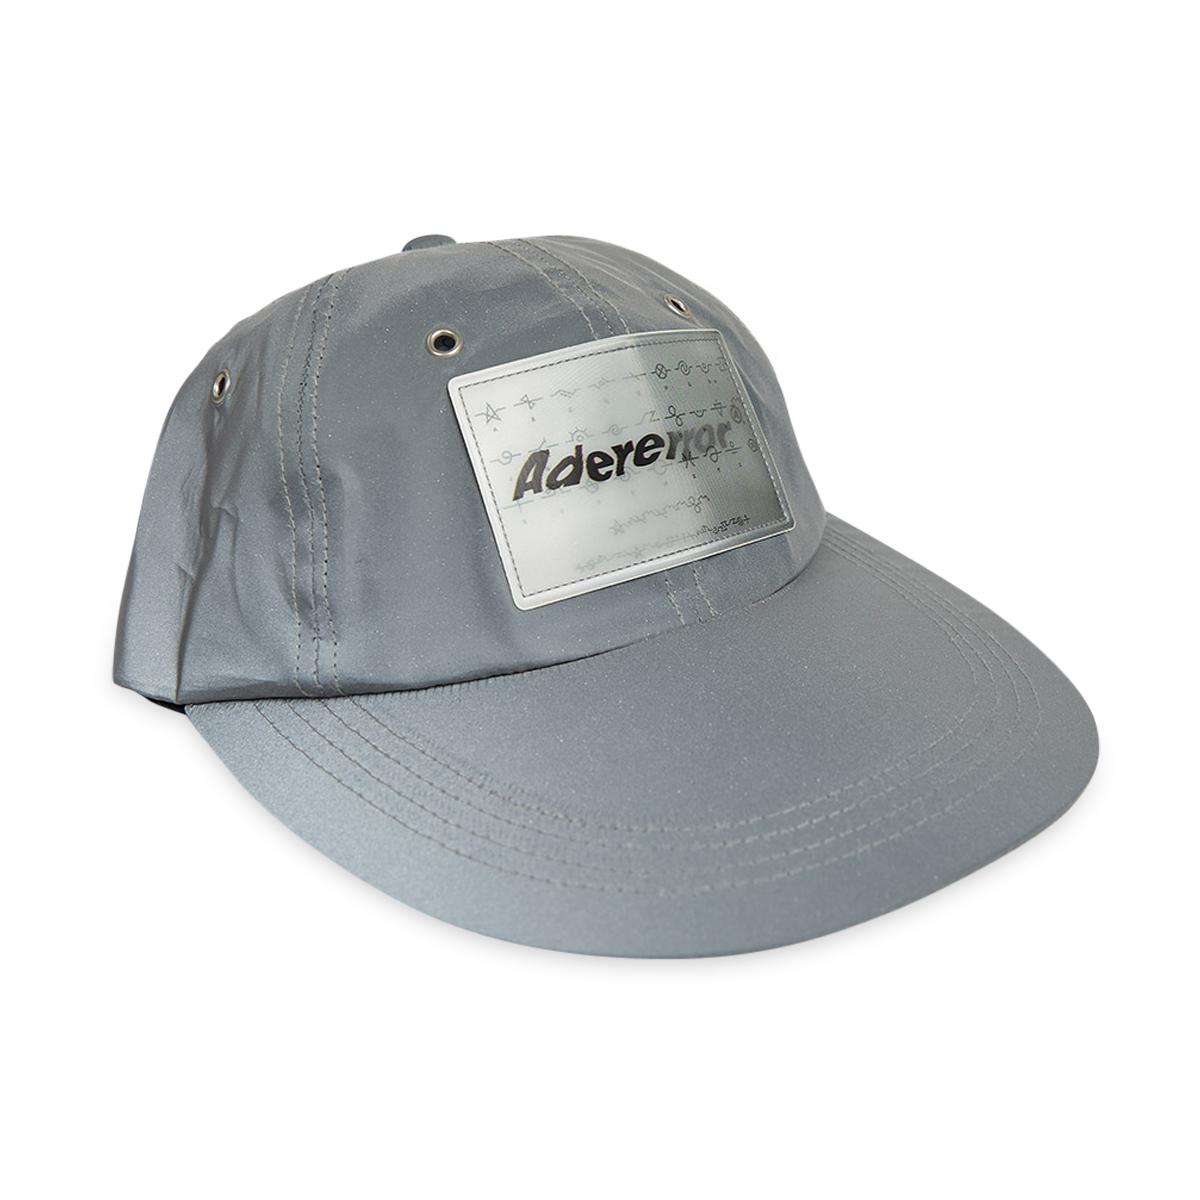 ADER Error Signature A Cap